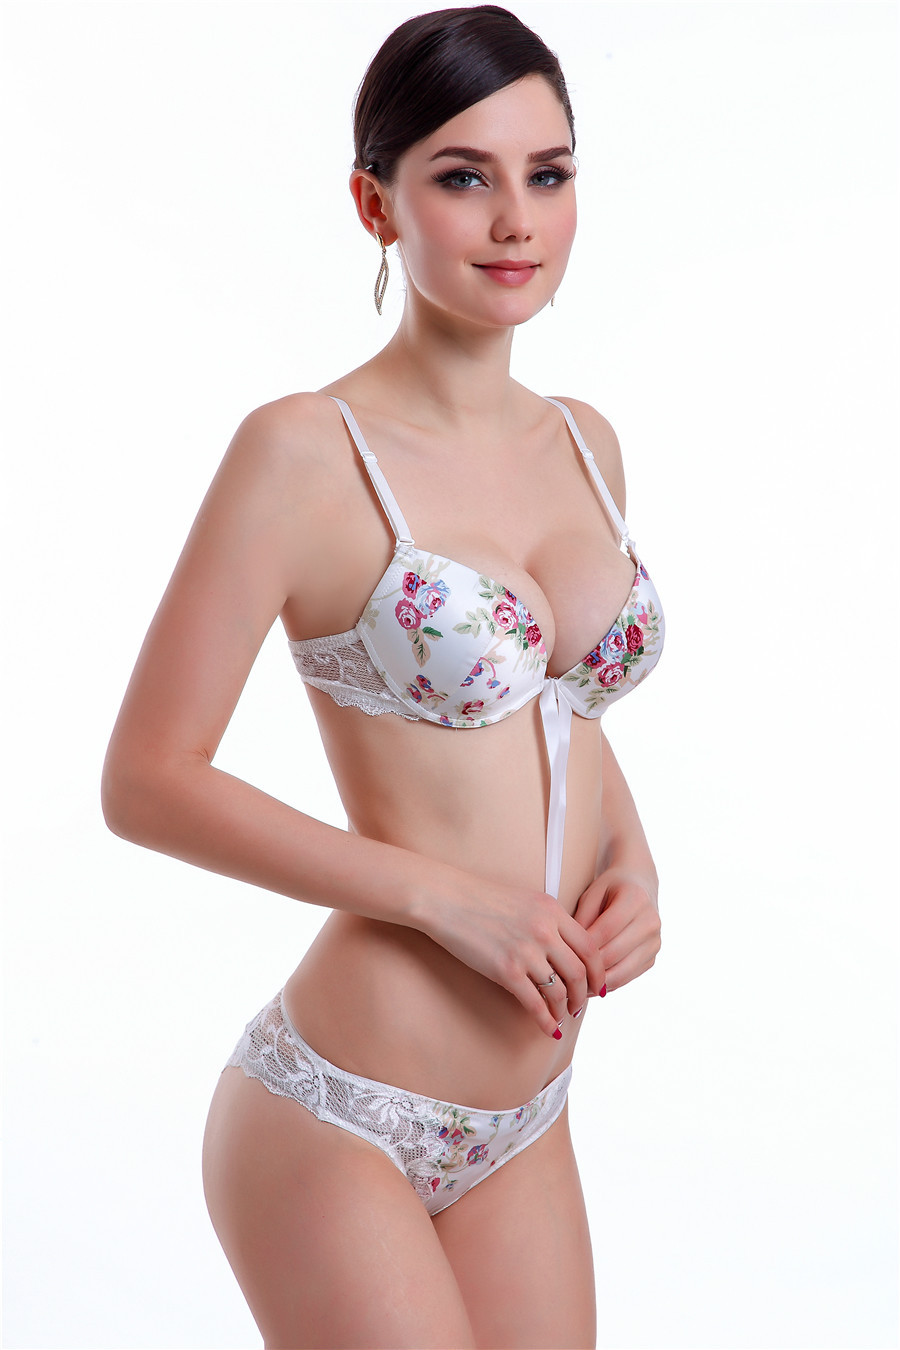 Junior girl underwear model bra panties